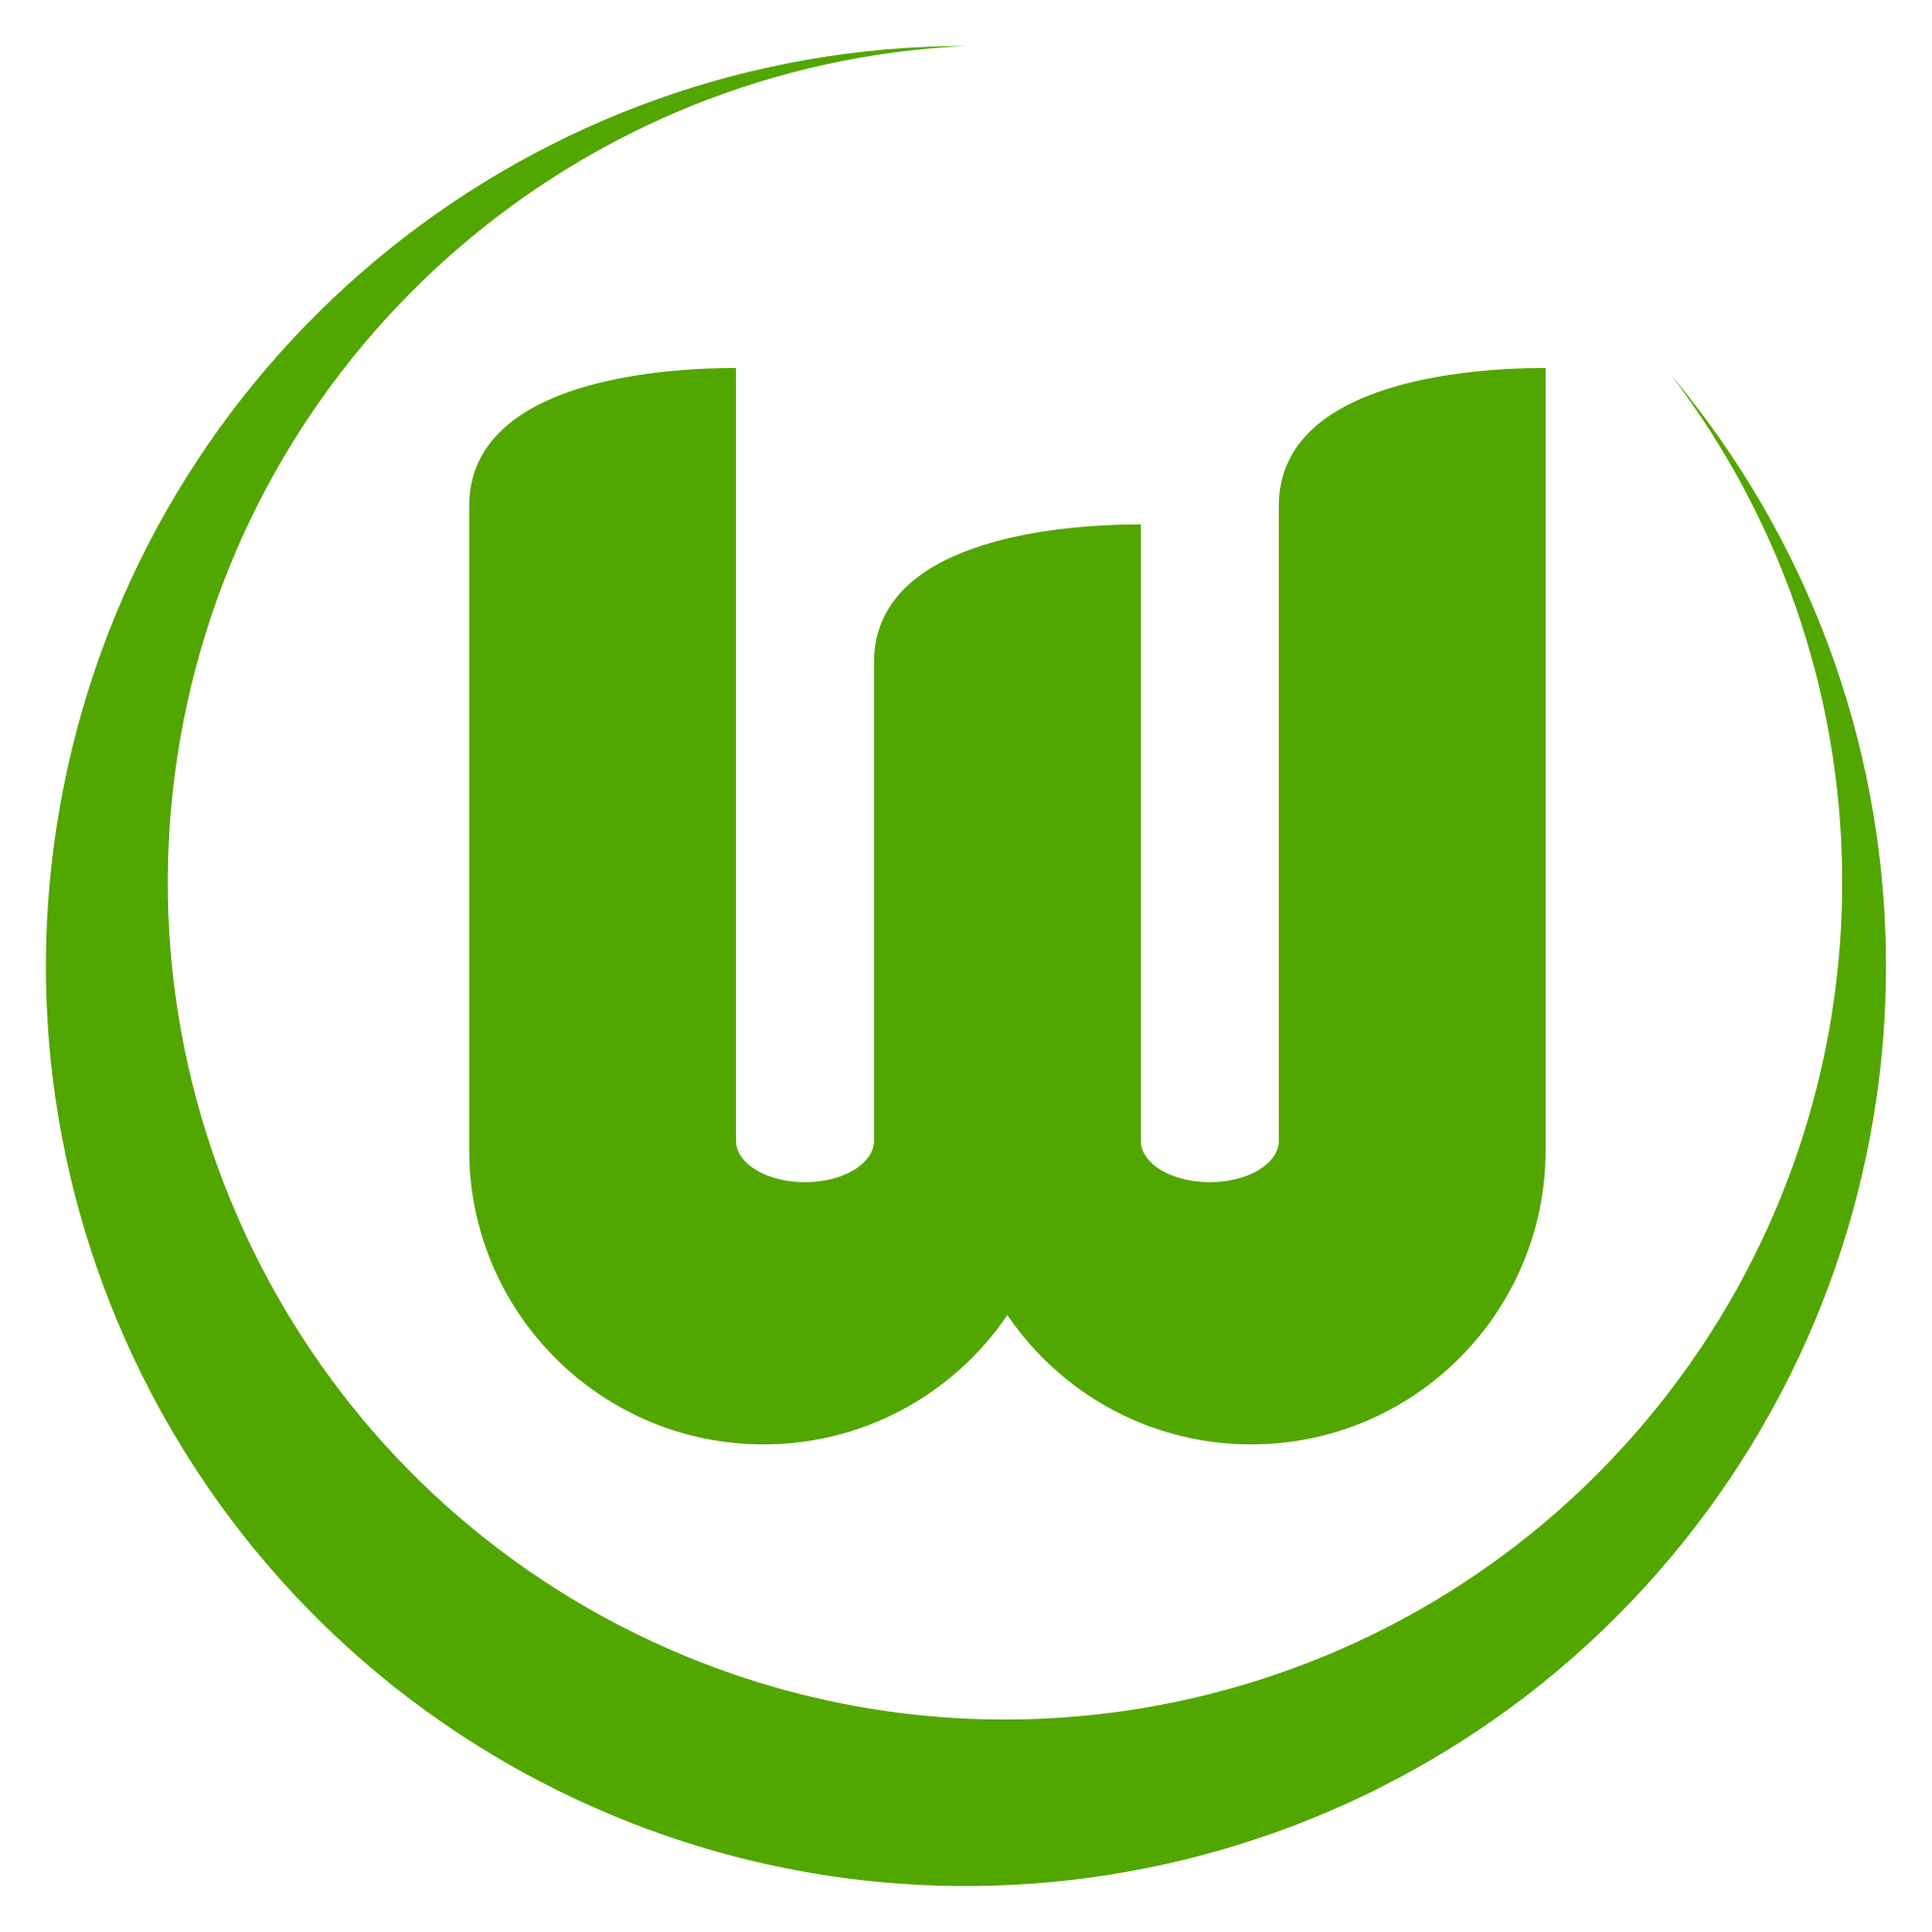 [Imagen: VfL_Wolfsburg_Logo.png]